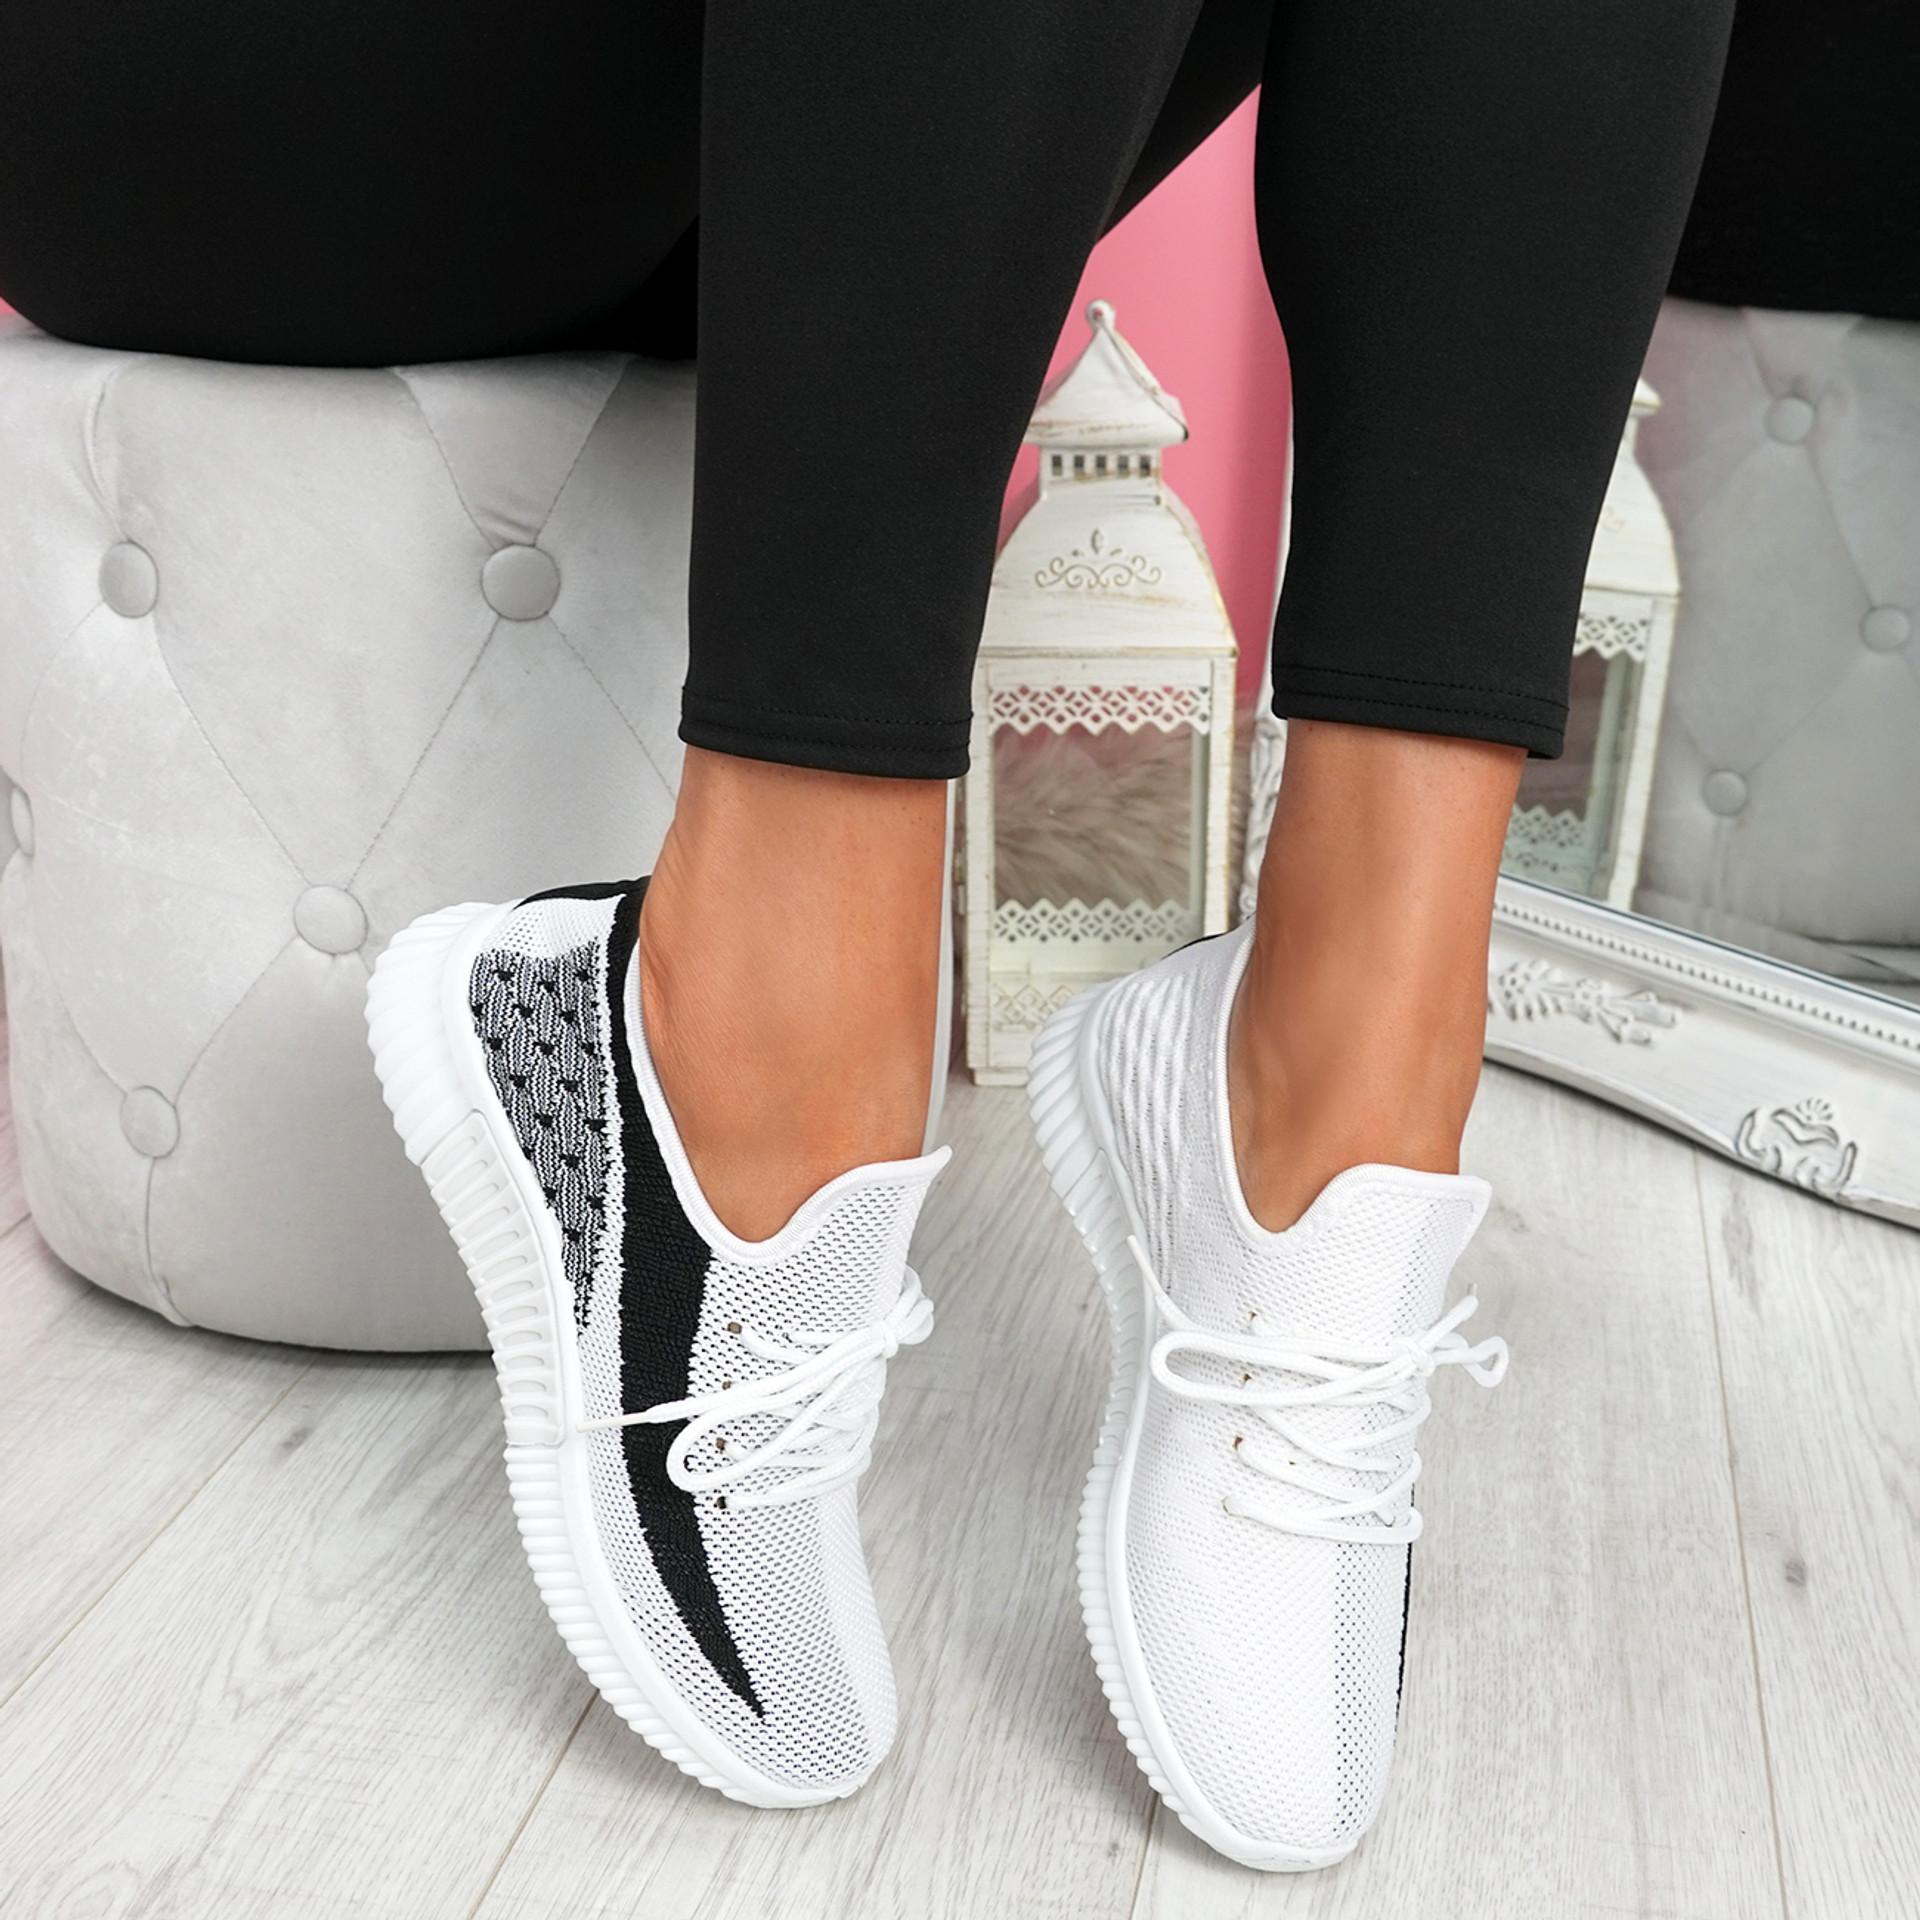 Nova White Lace Up Knit Trainers